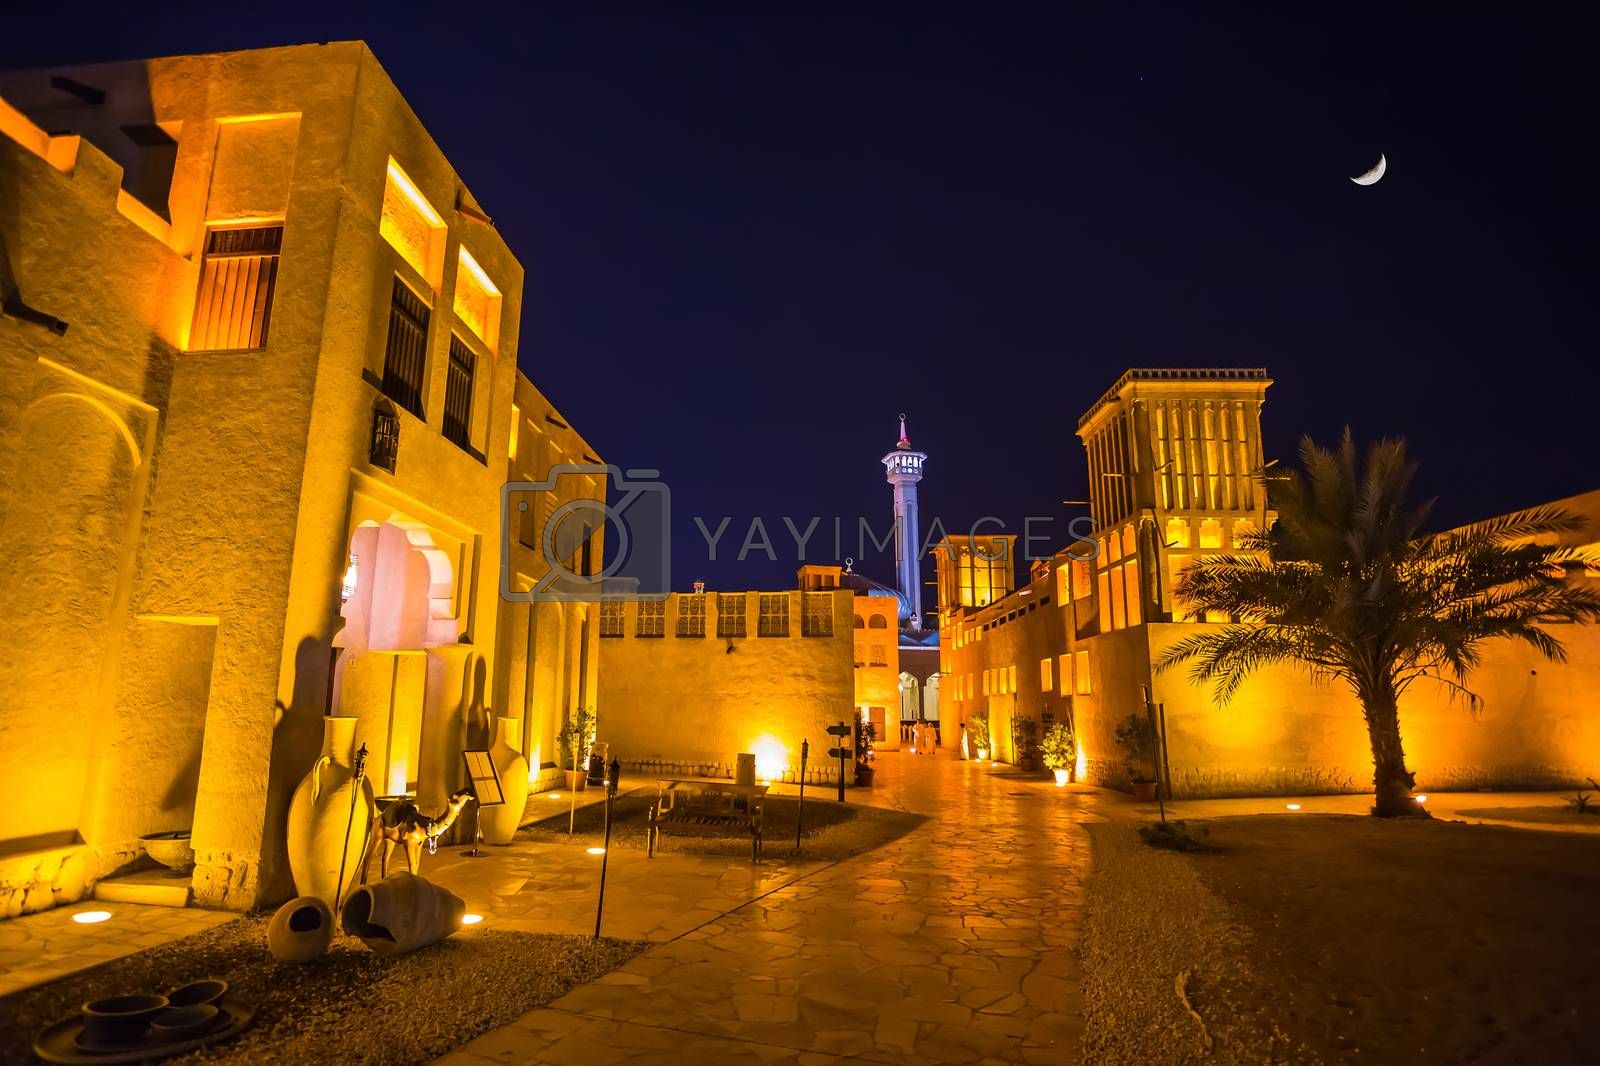 Arab Street in the old part of Dubai, UAE